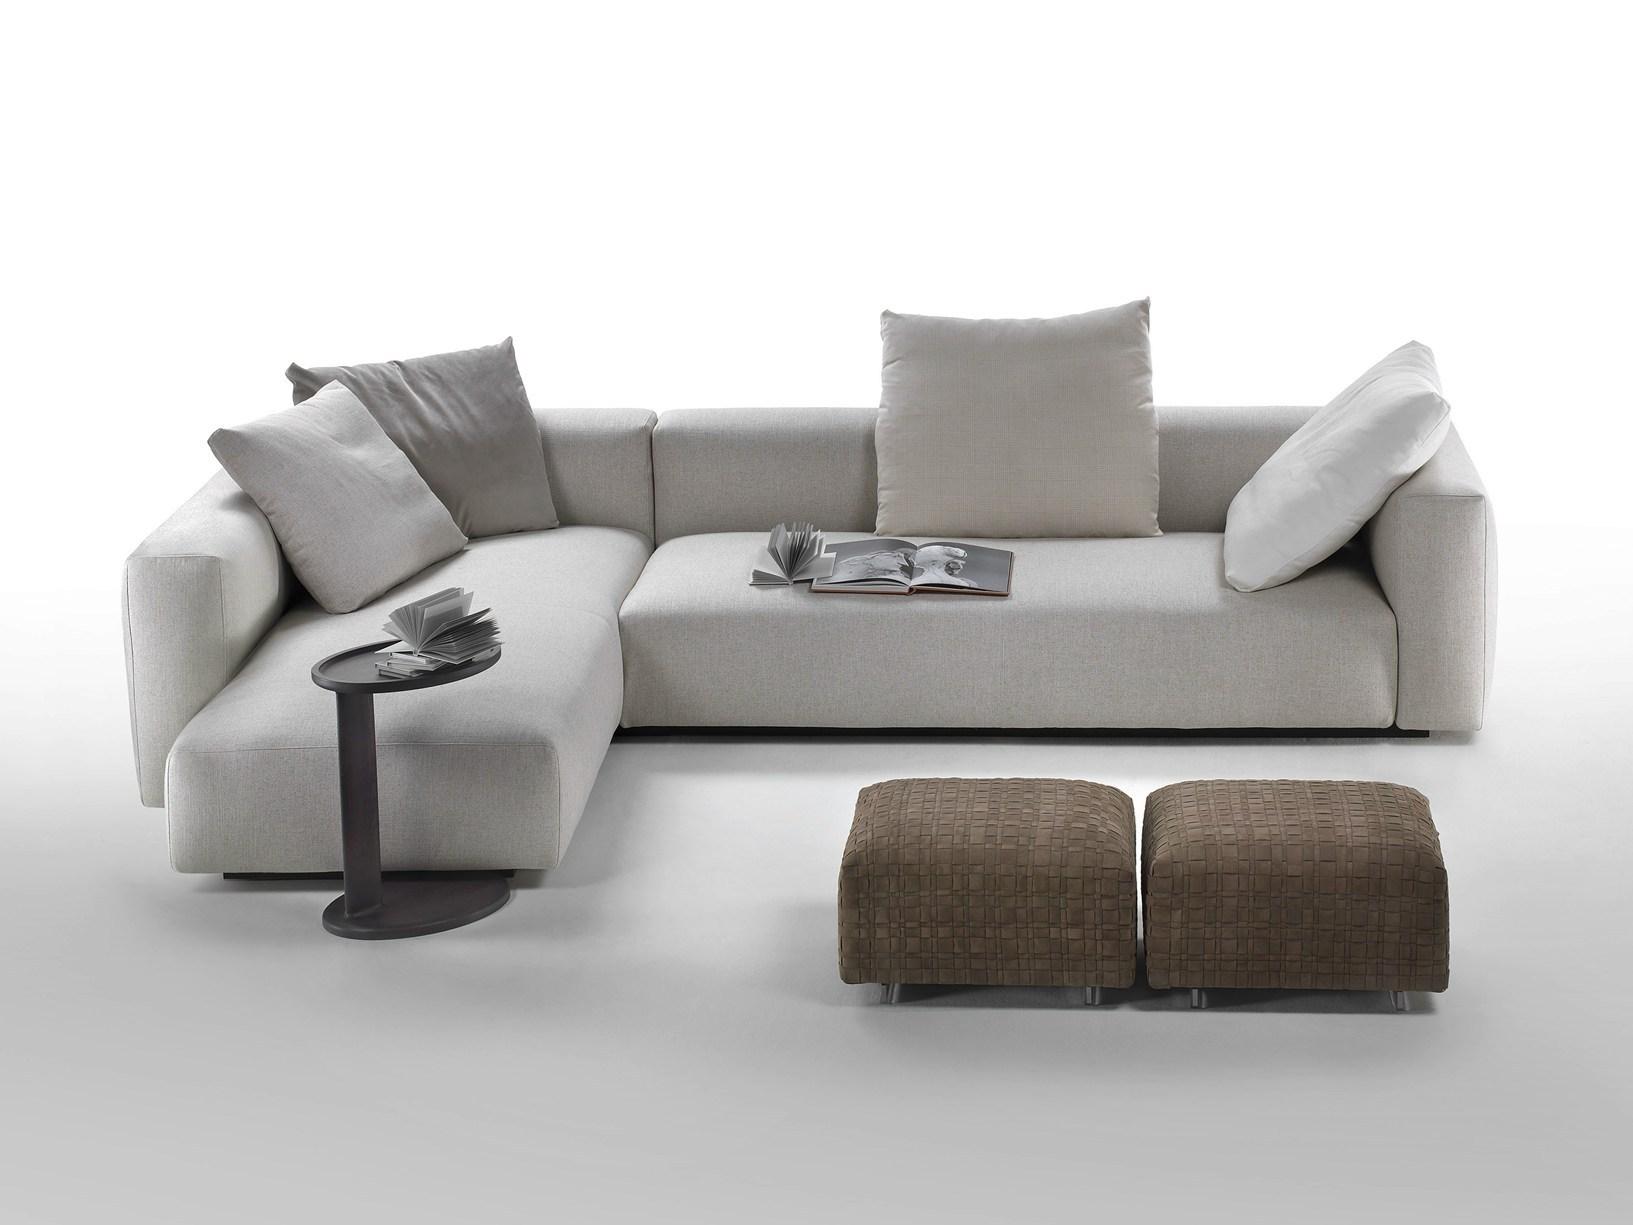 lario modular sofa by antonio citterio for flexform sohomod blog. Black Bedroom Furniture Sets. Home Design Ideas